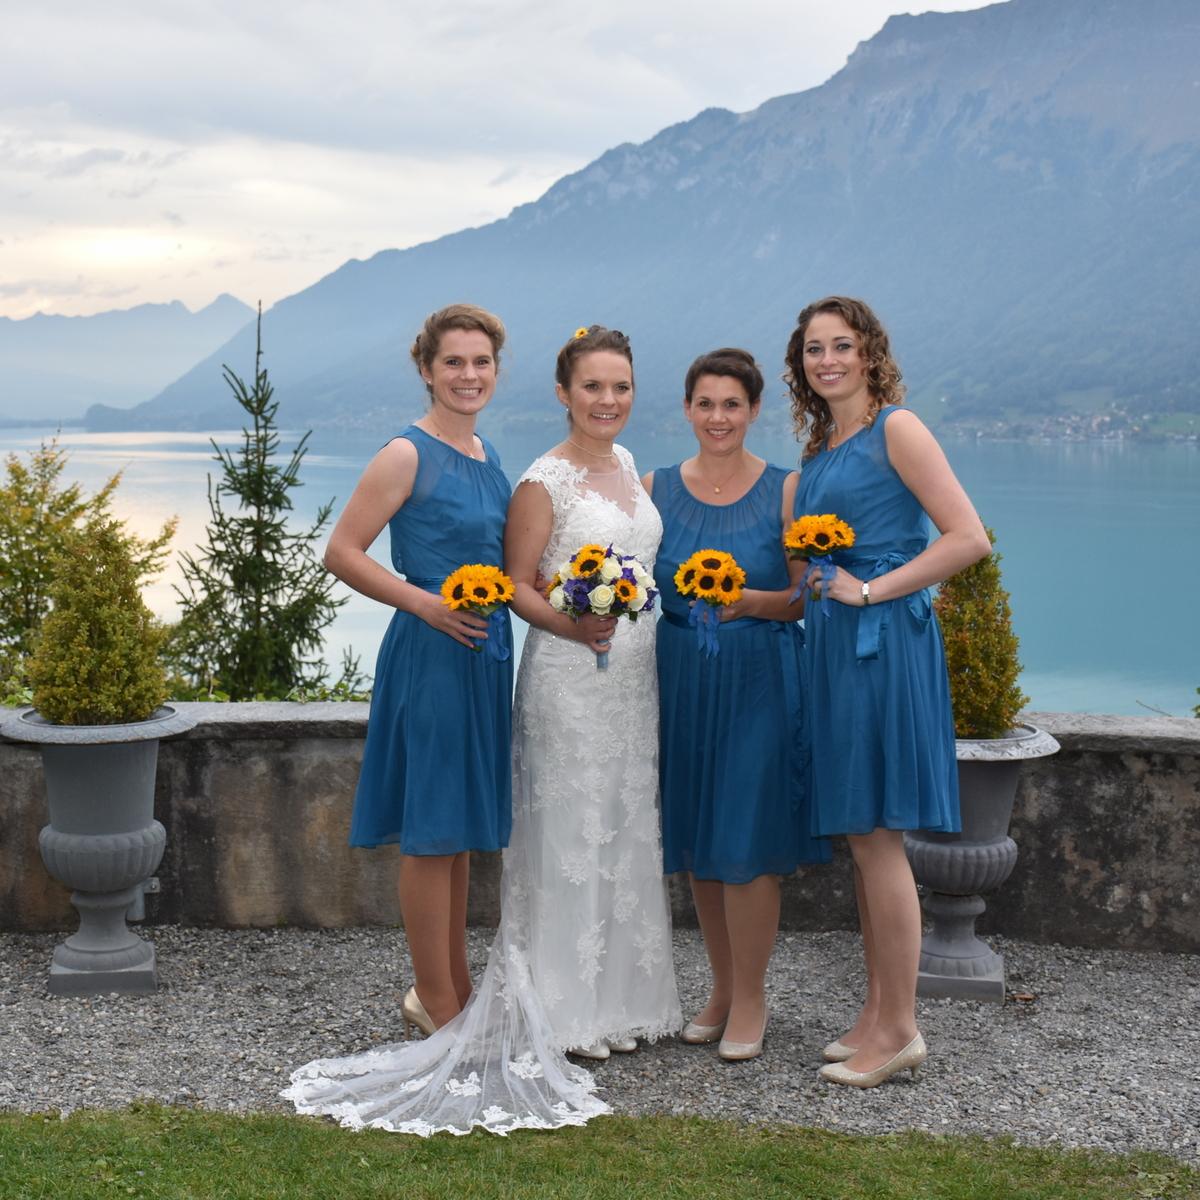 Hampshire Wedding Photography - 2015 highlights 109